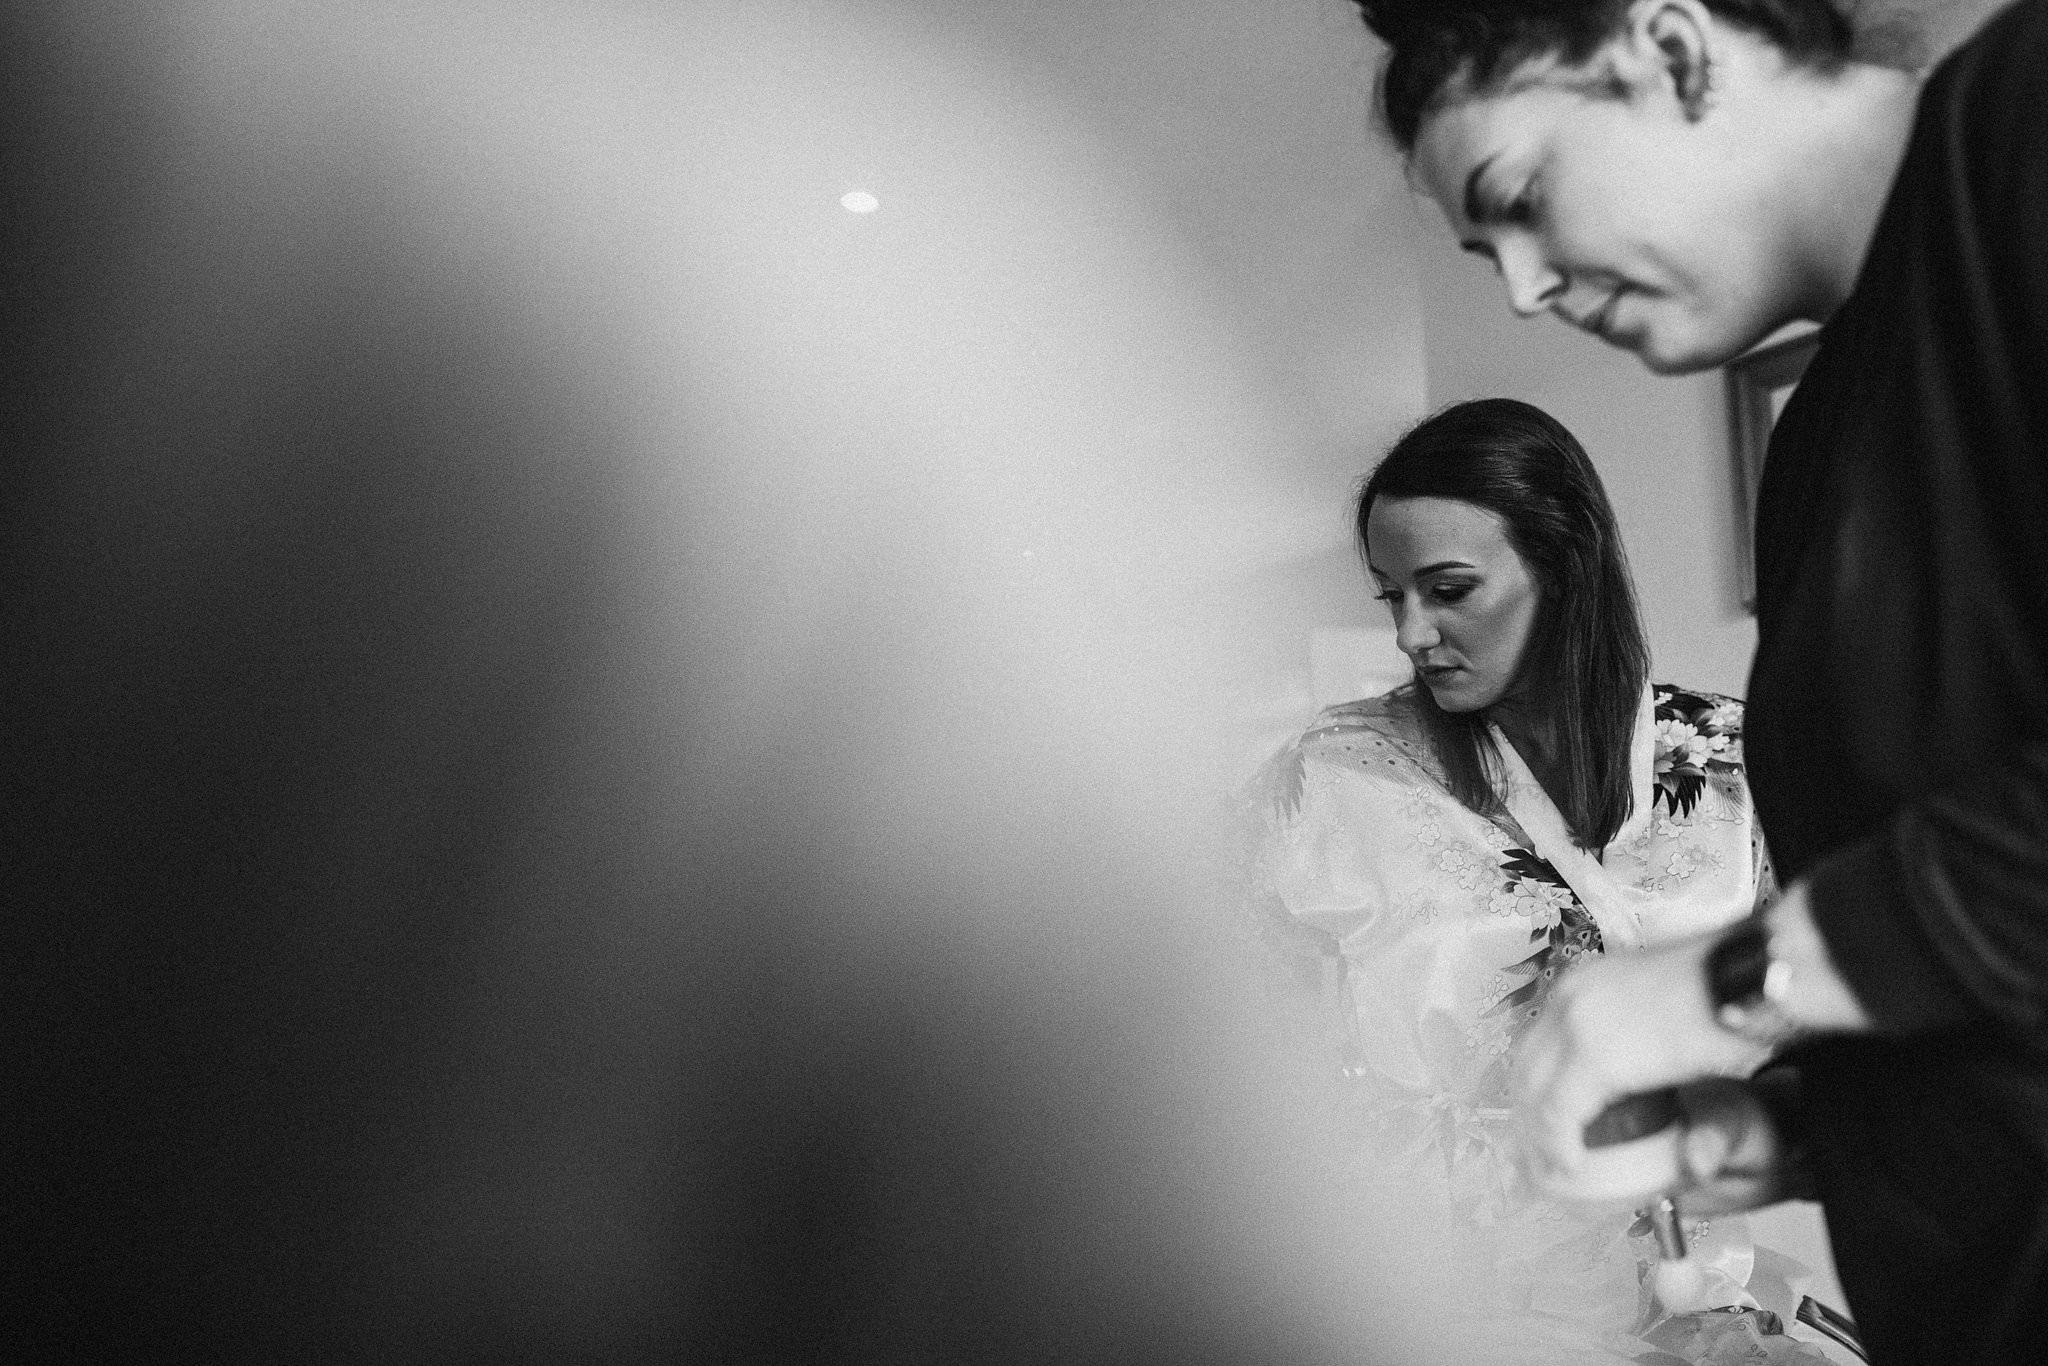 kirknewton stables wedding photographer (4).jpg